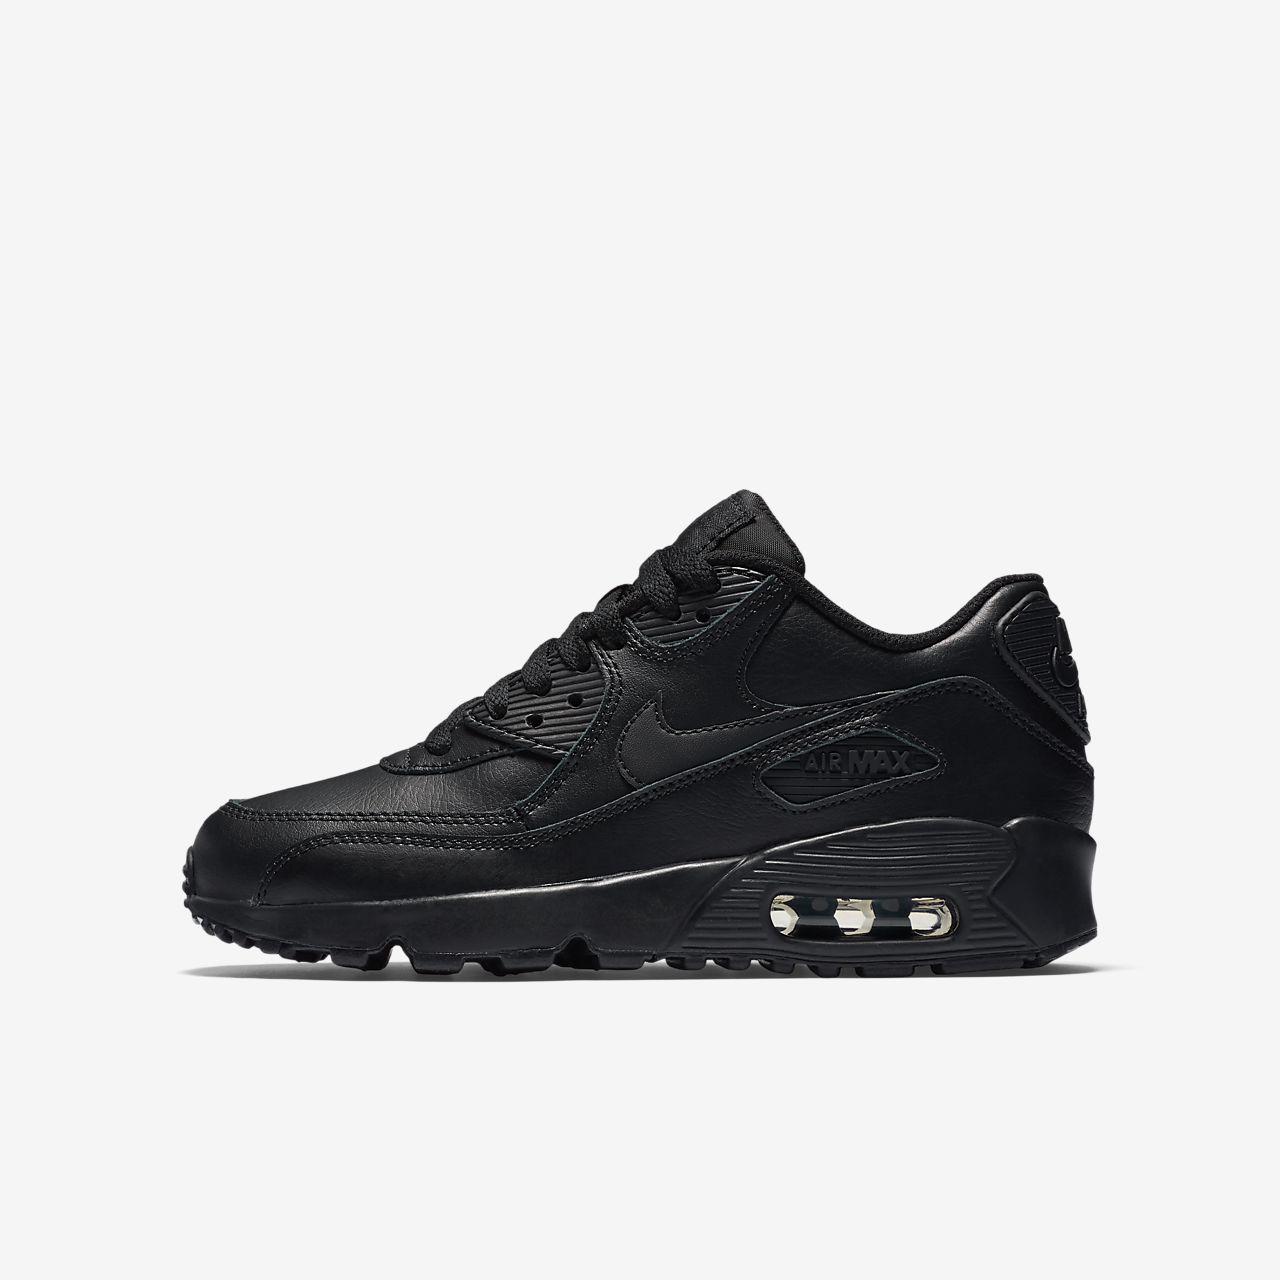 Nike Air Max 90 Leather - sko til store børn